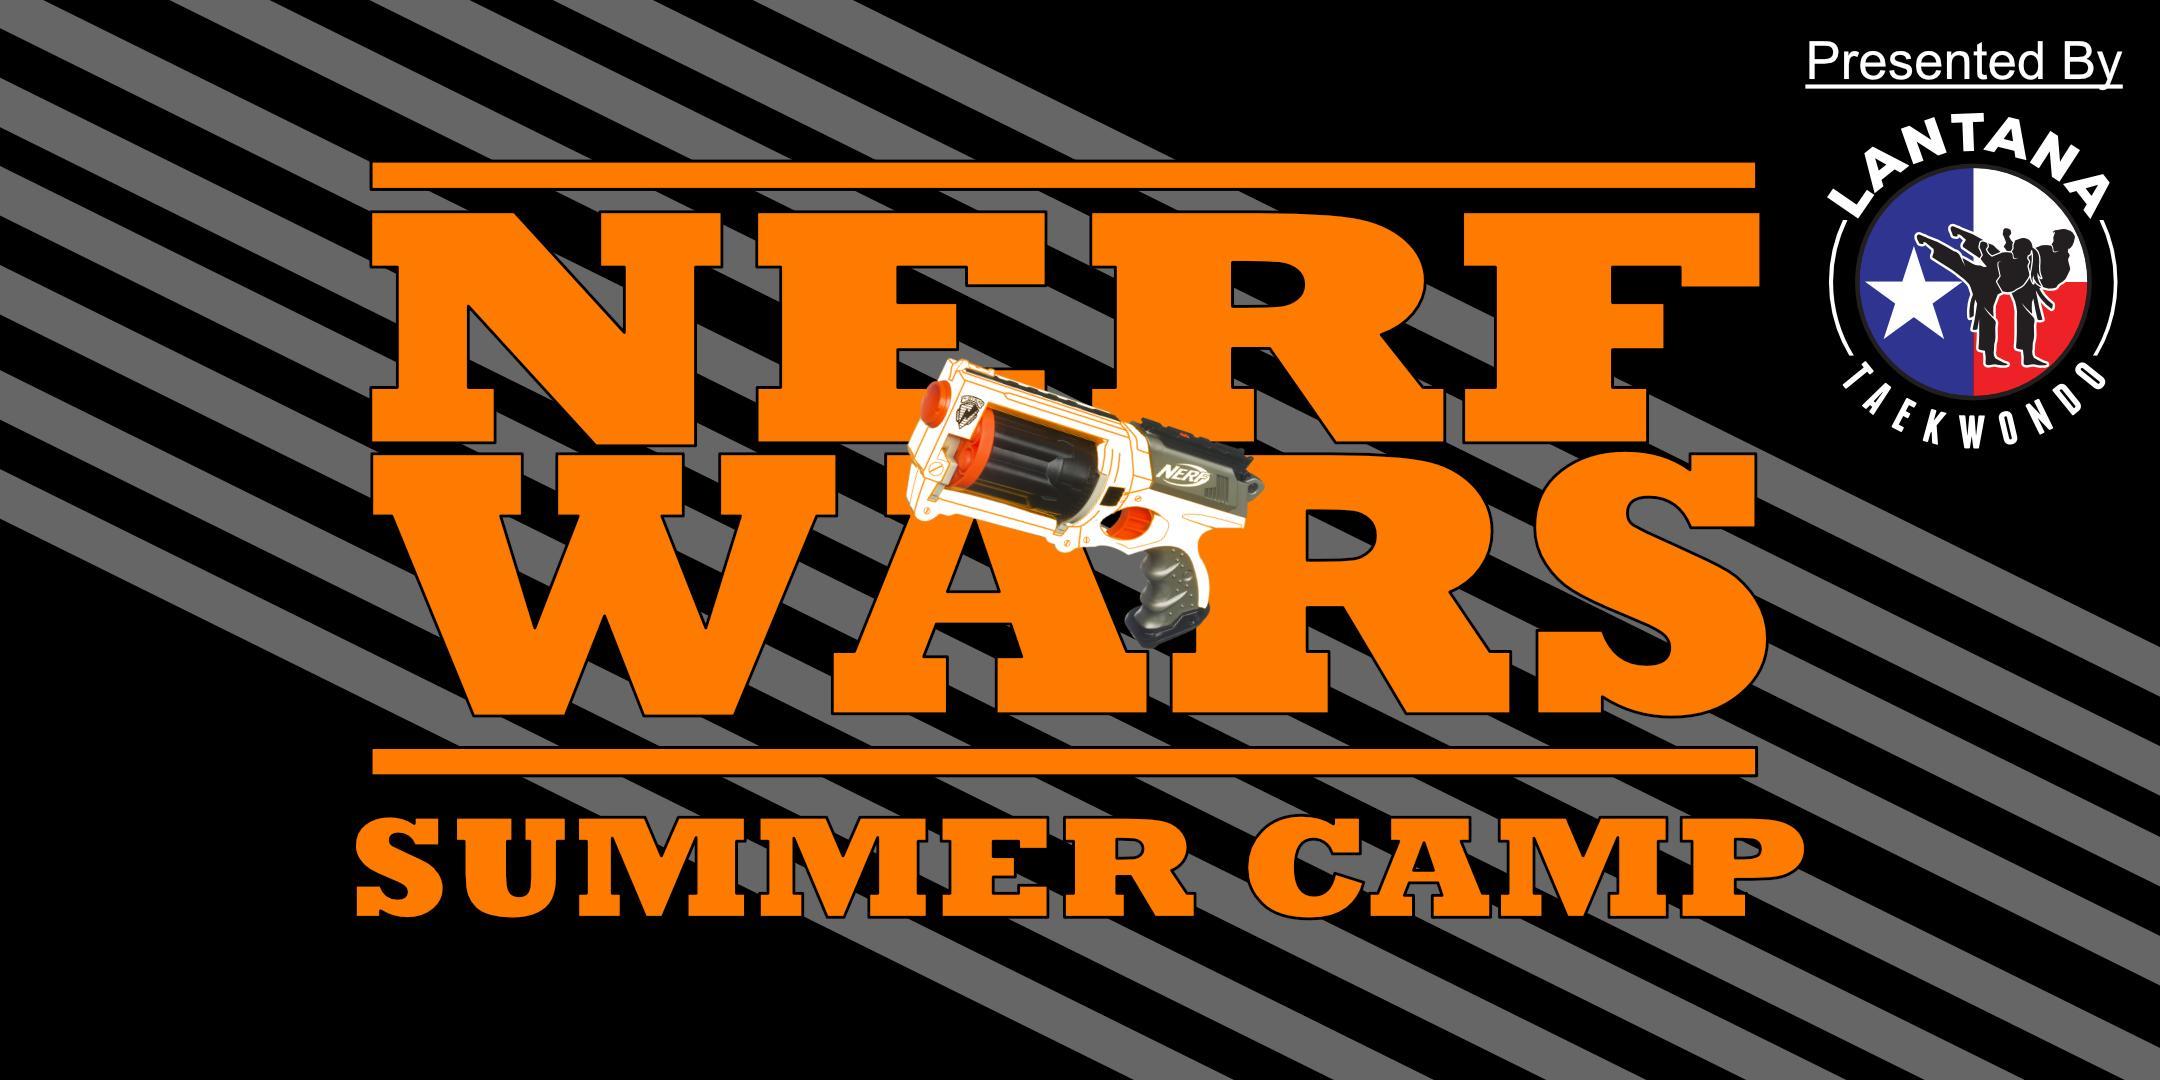 Lantana Summer Camps: Nerf Wars